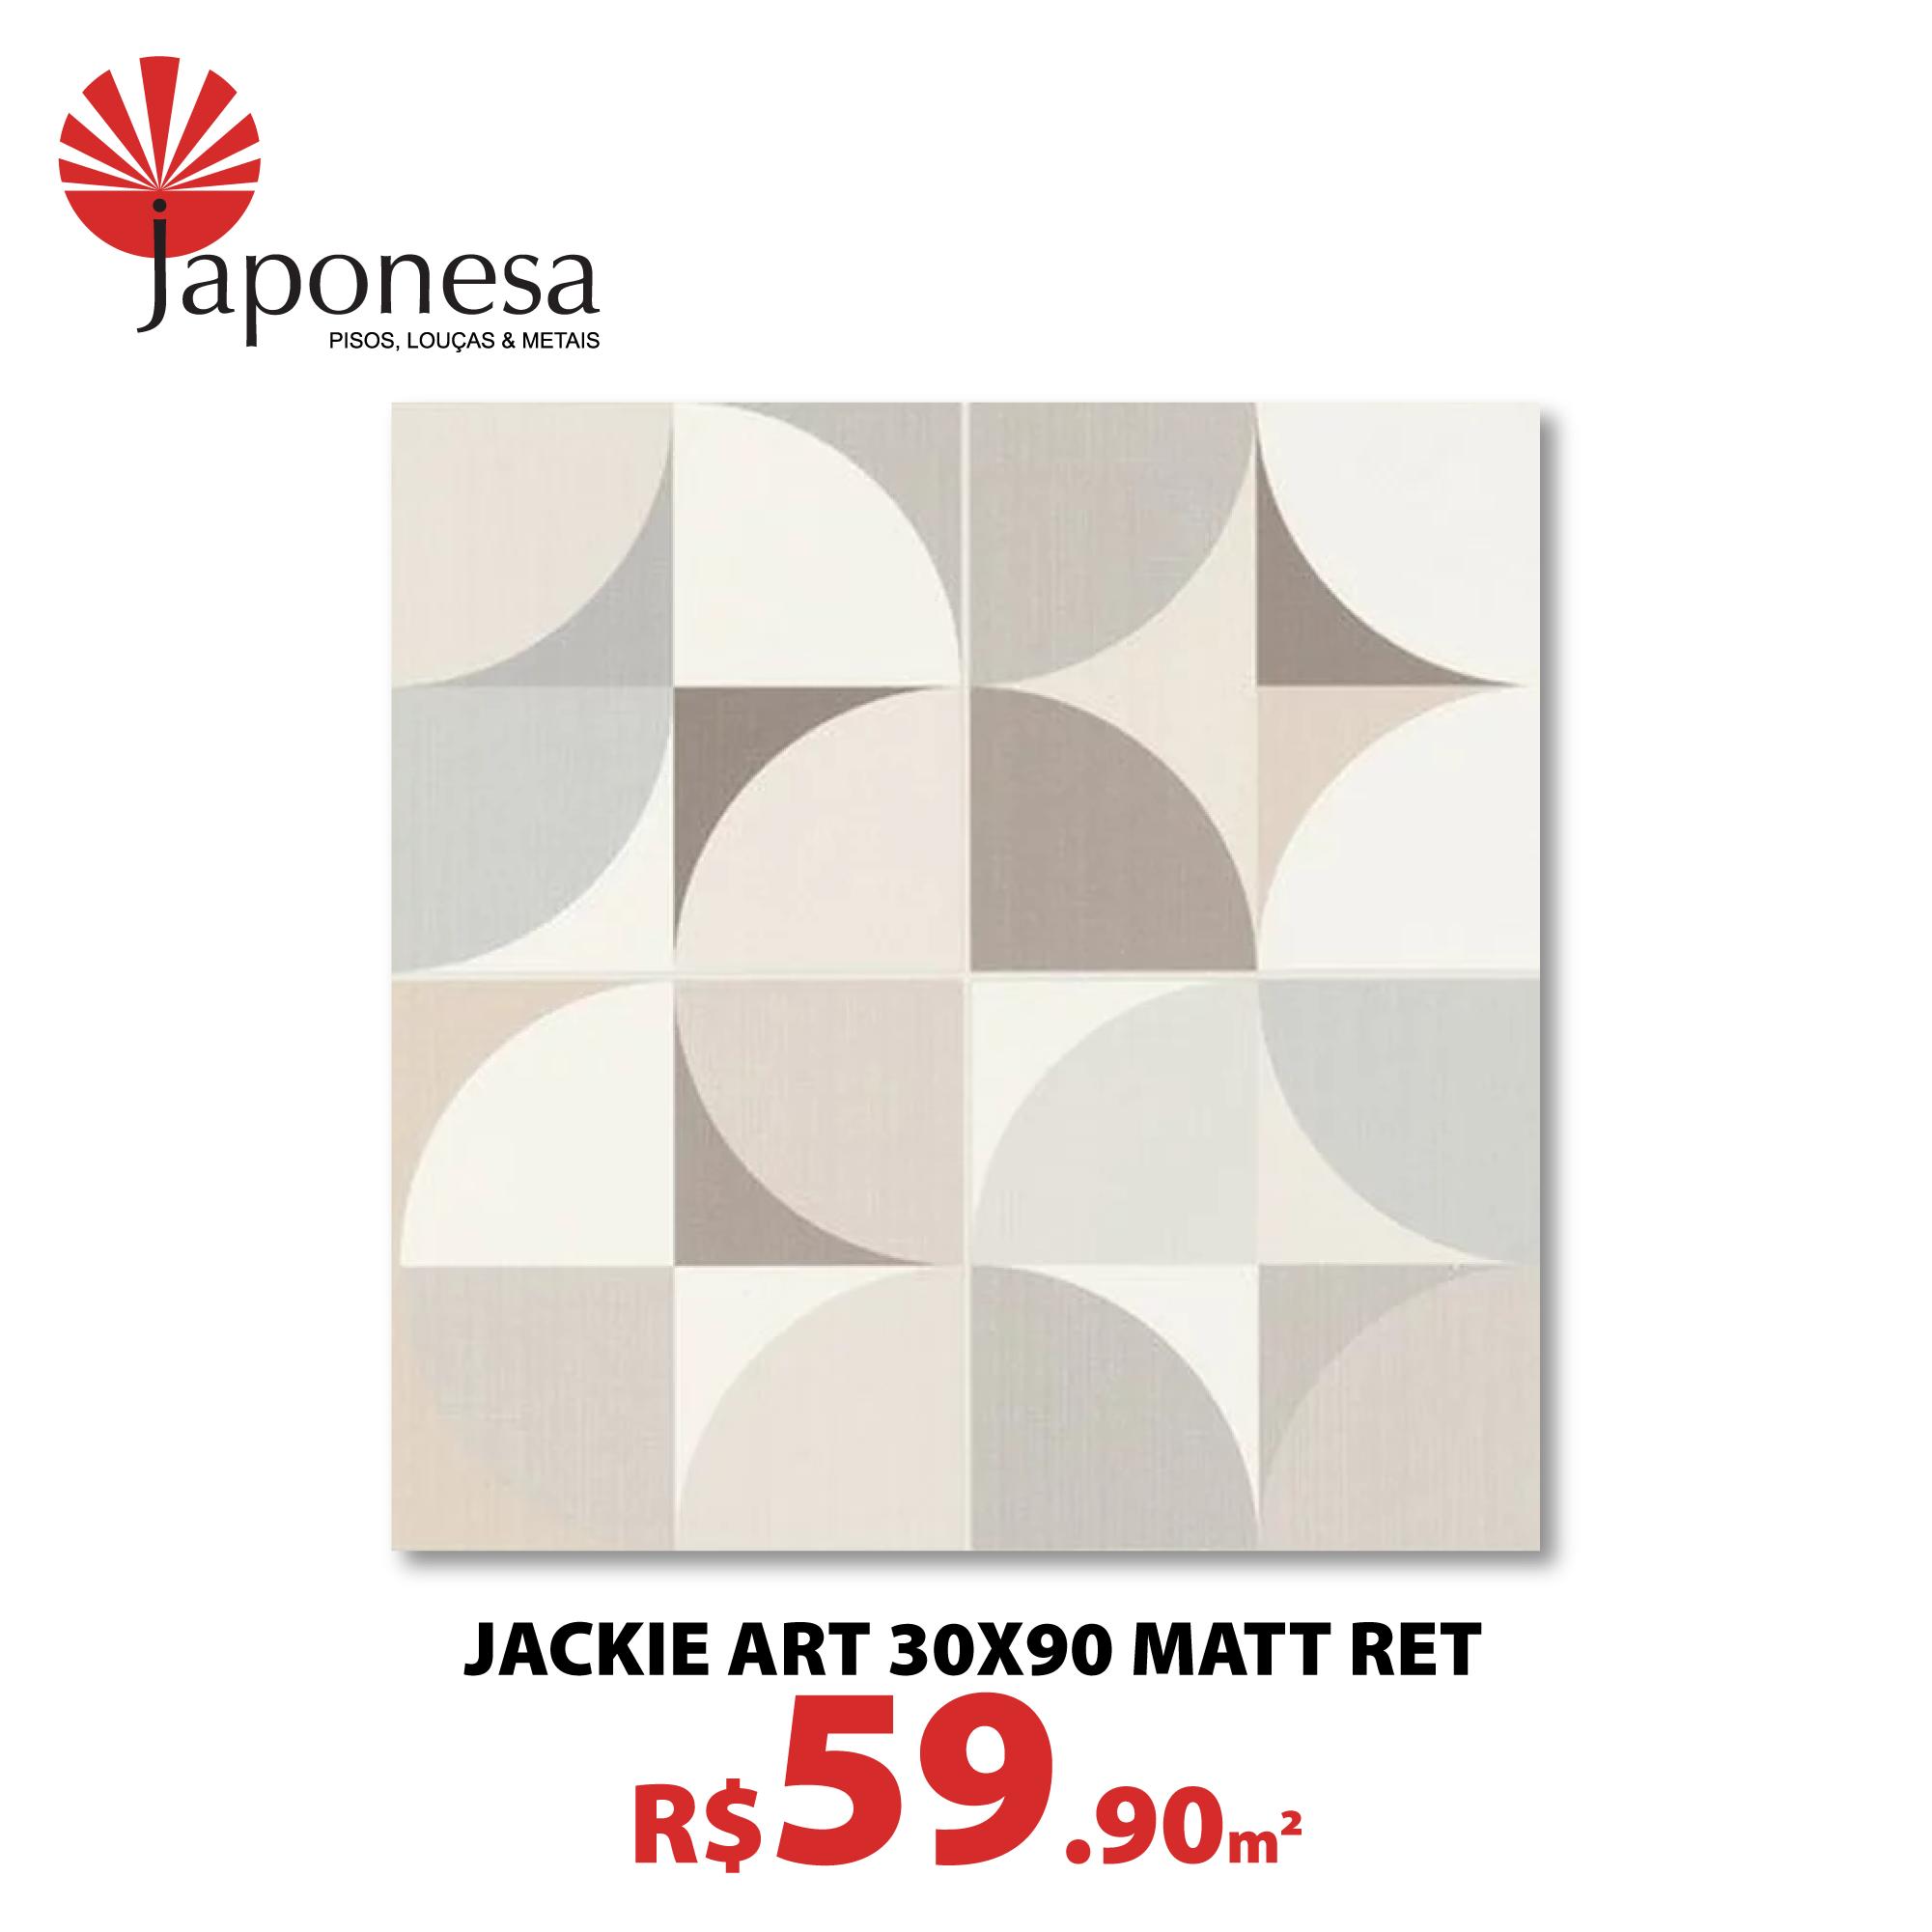 Jackie Art 30×90 Matt Ret